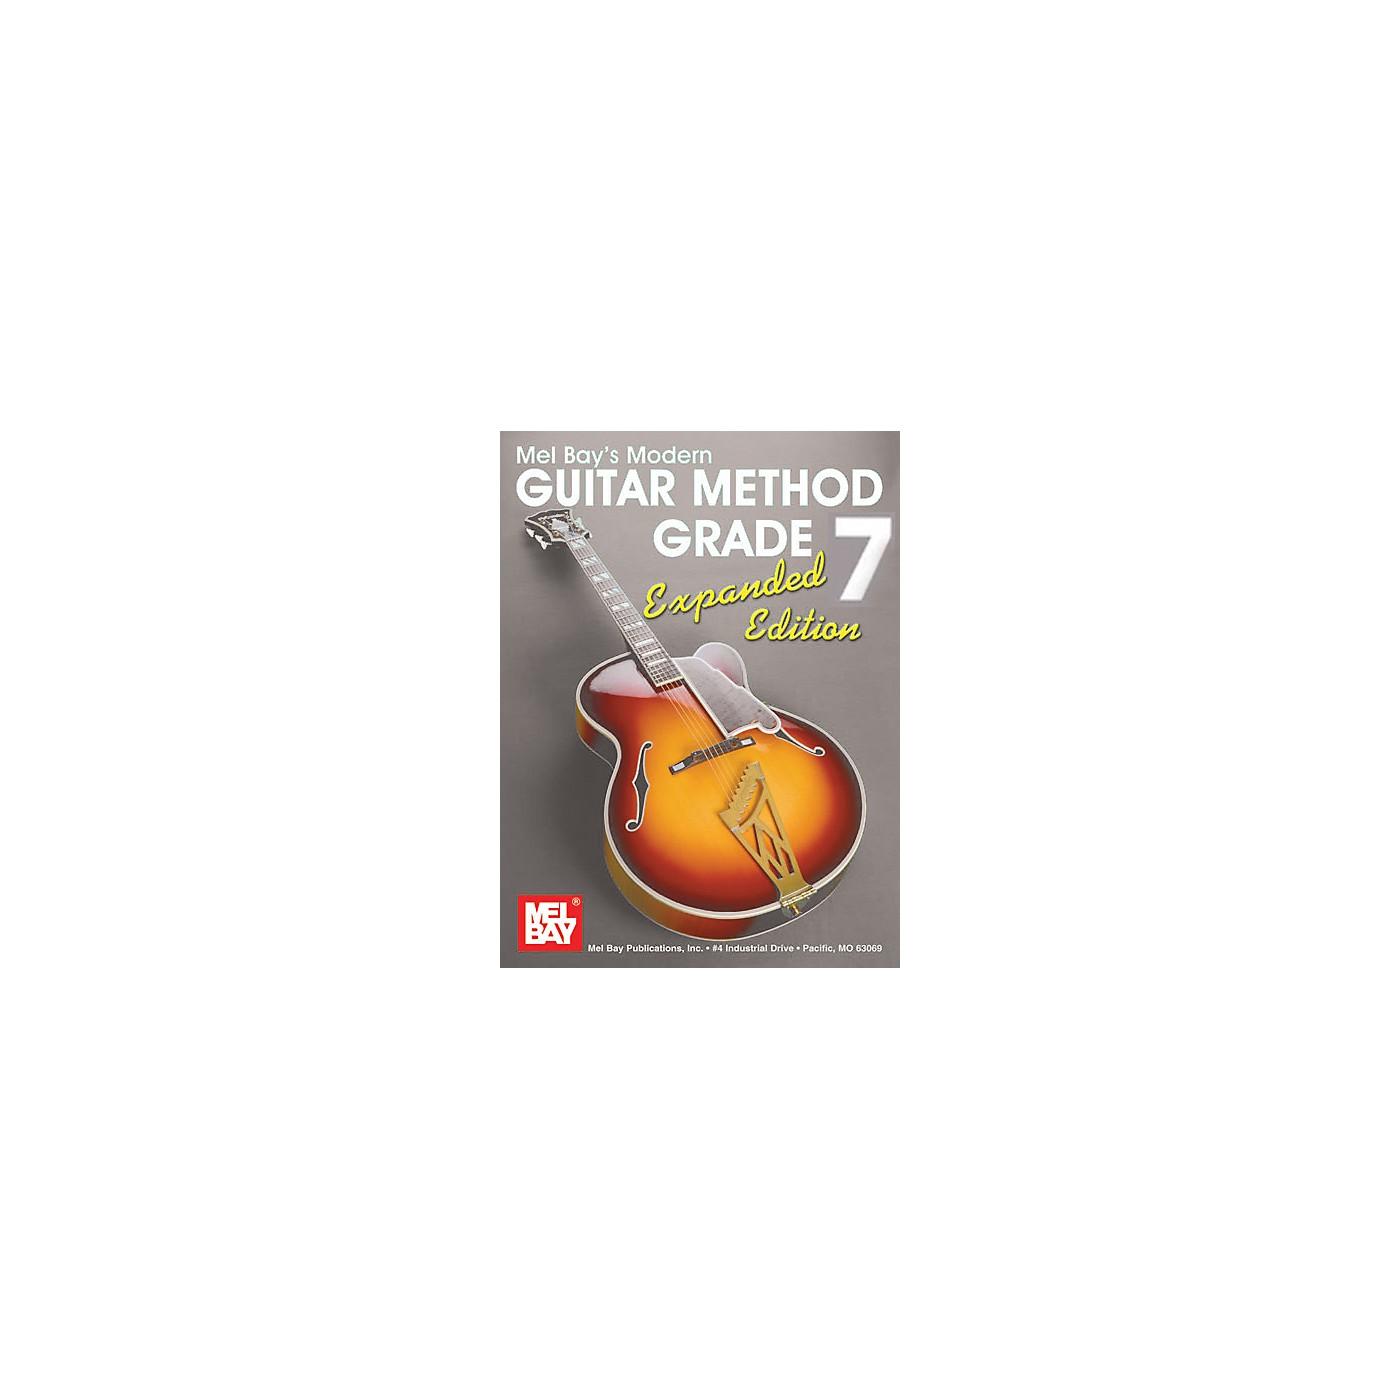 Mel Bay Modern Guitar Method Grade 7 Book - Expanded Edition thumbnail